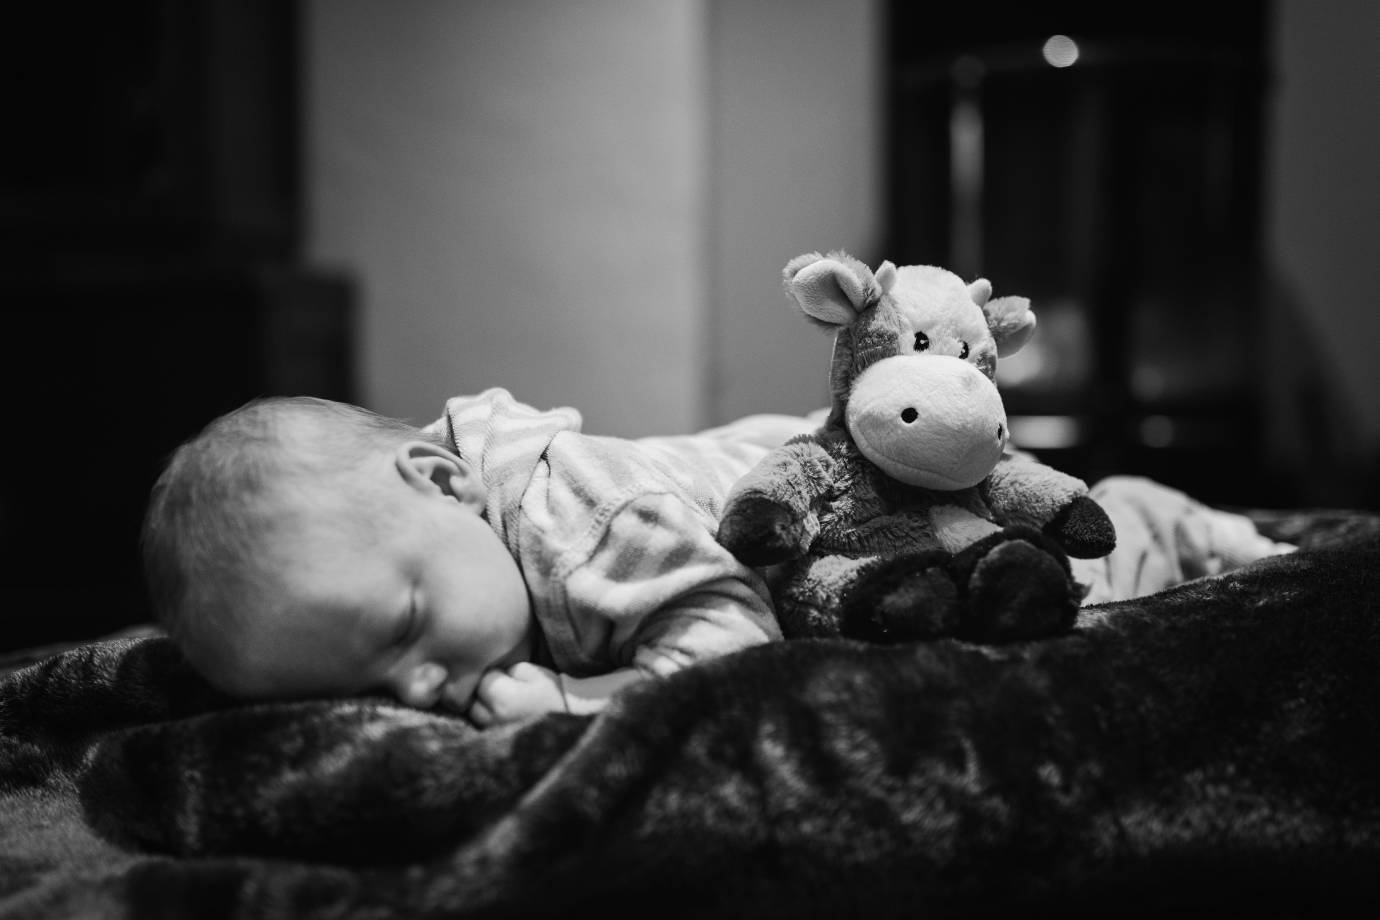 babyfotograf lilienthal 9 - Max